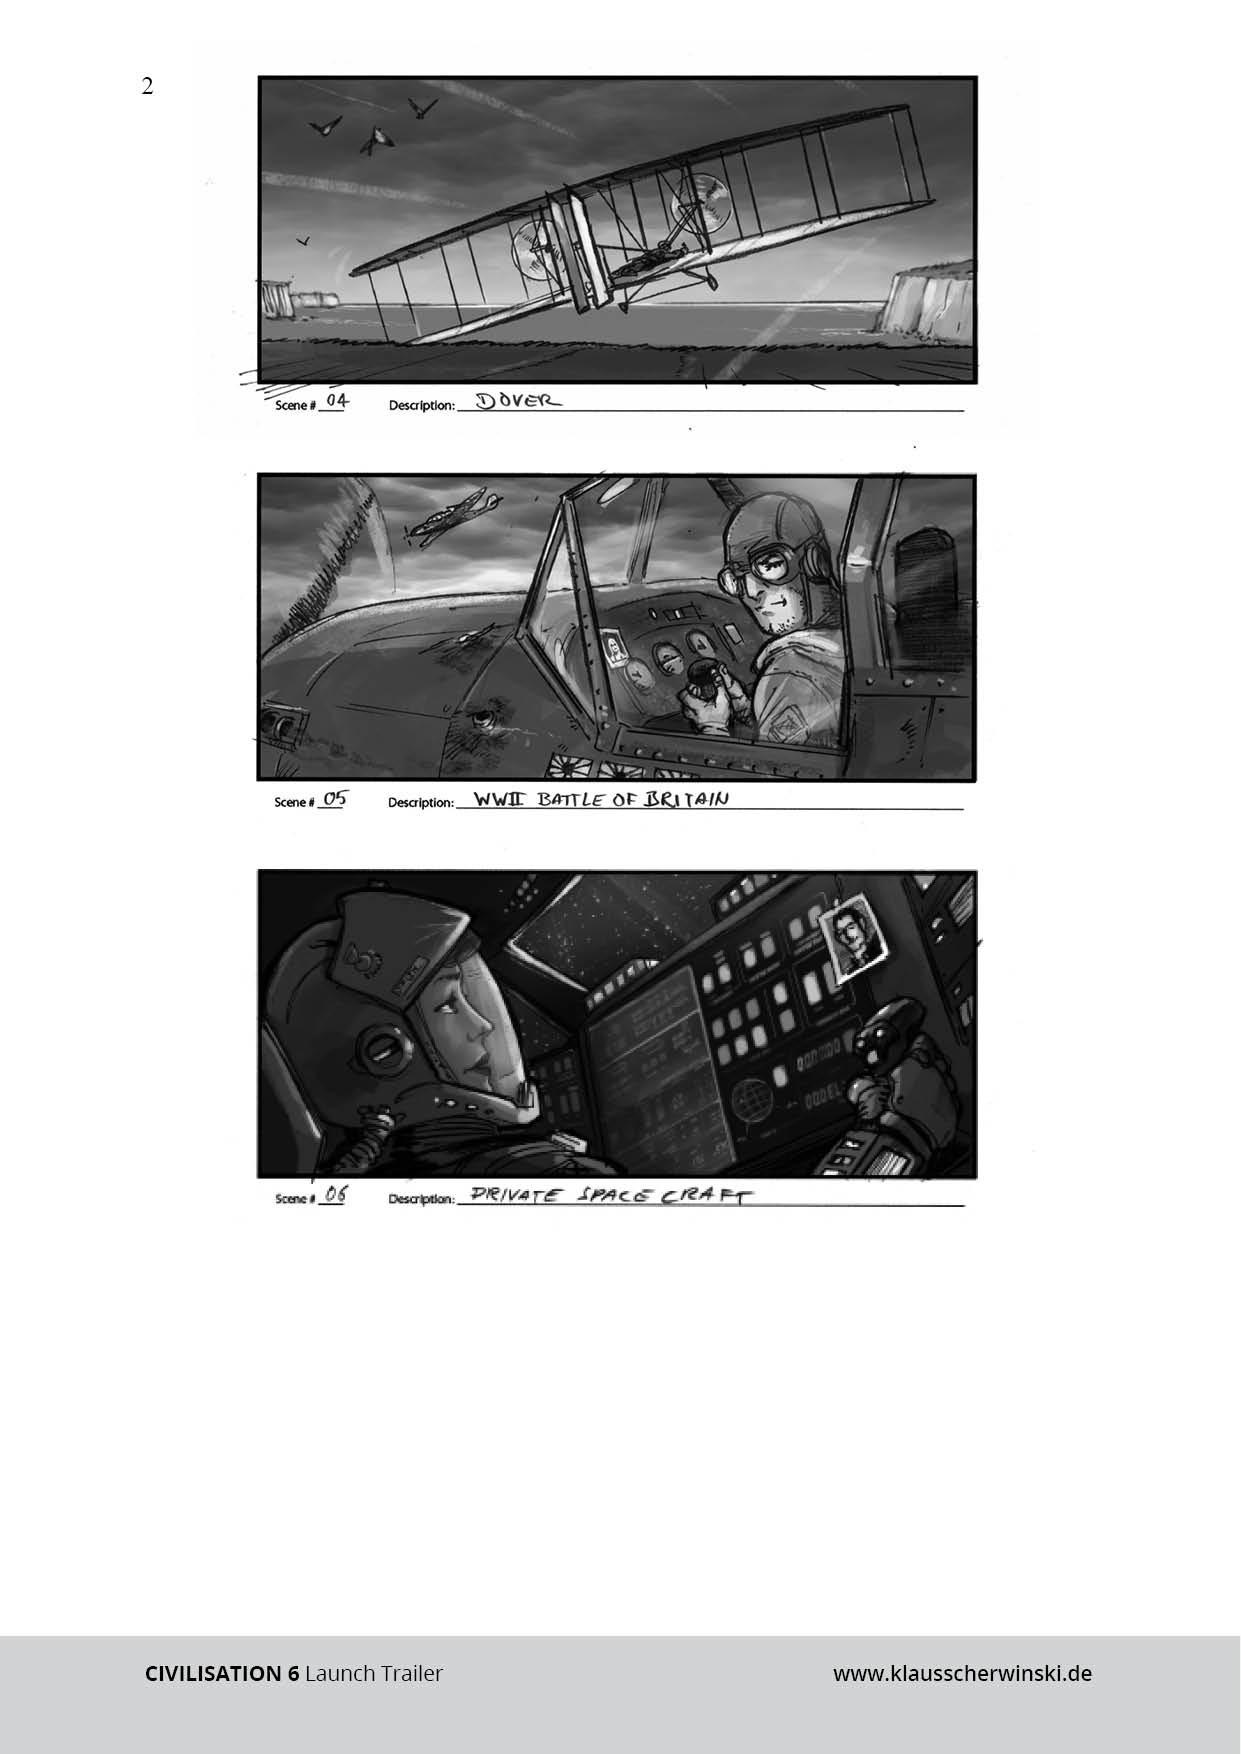 Klaus scherwinski sv civilisation6 storyboards3